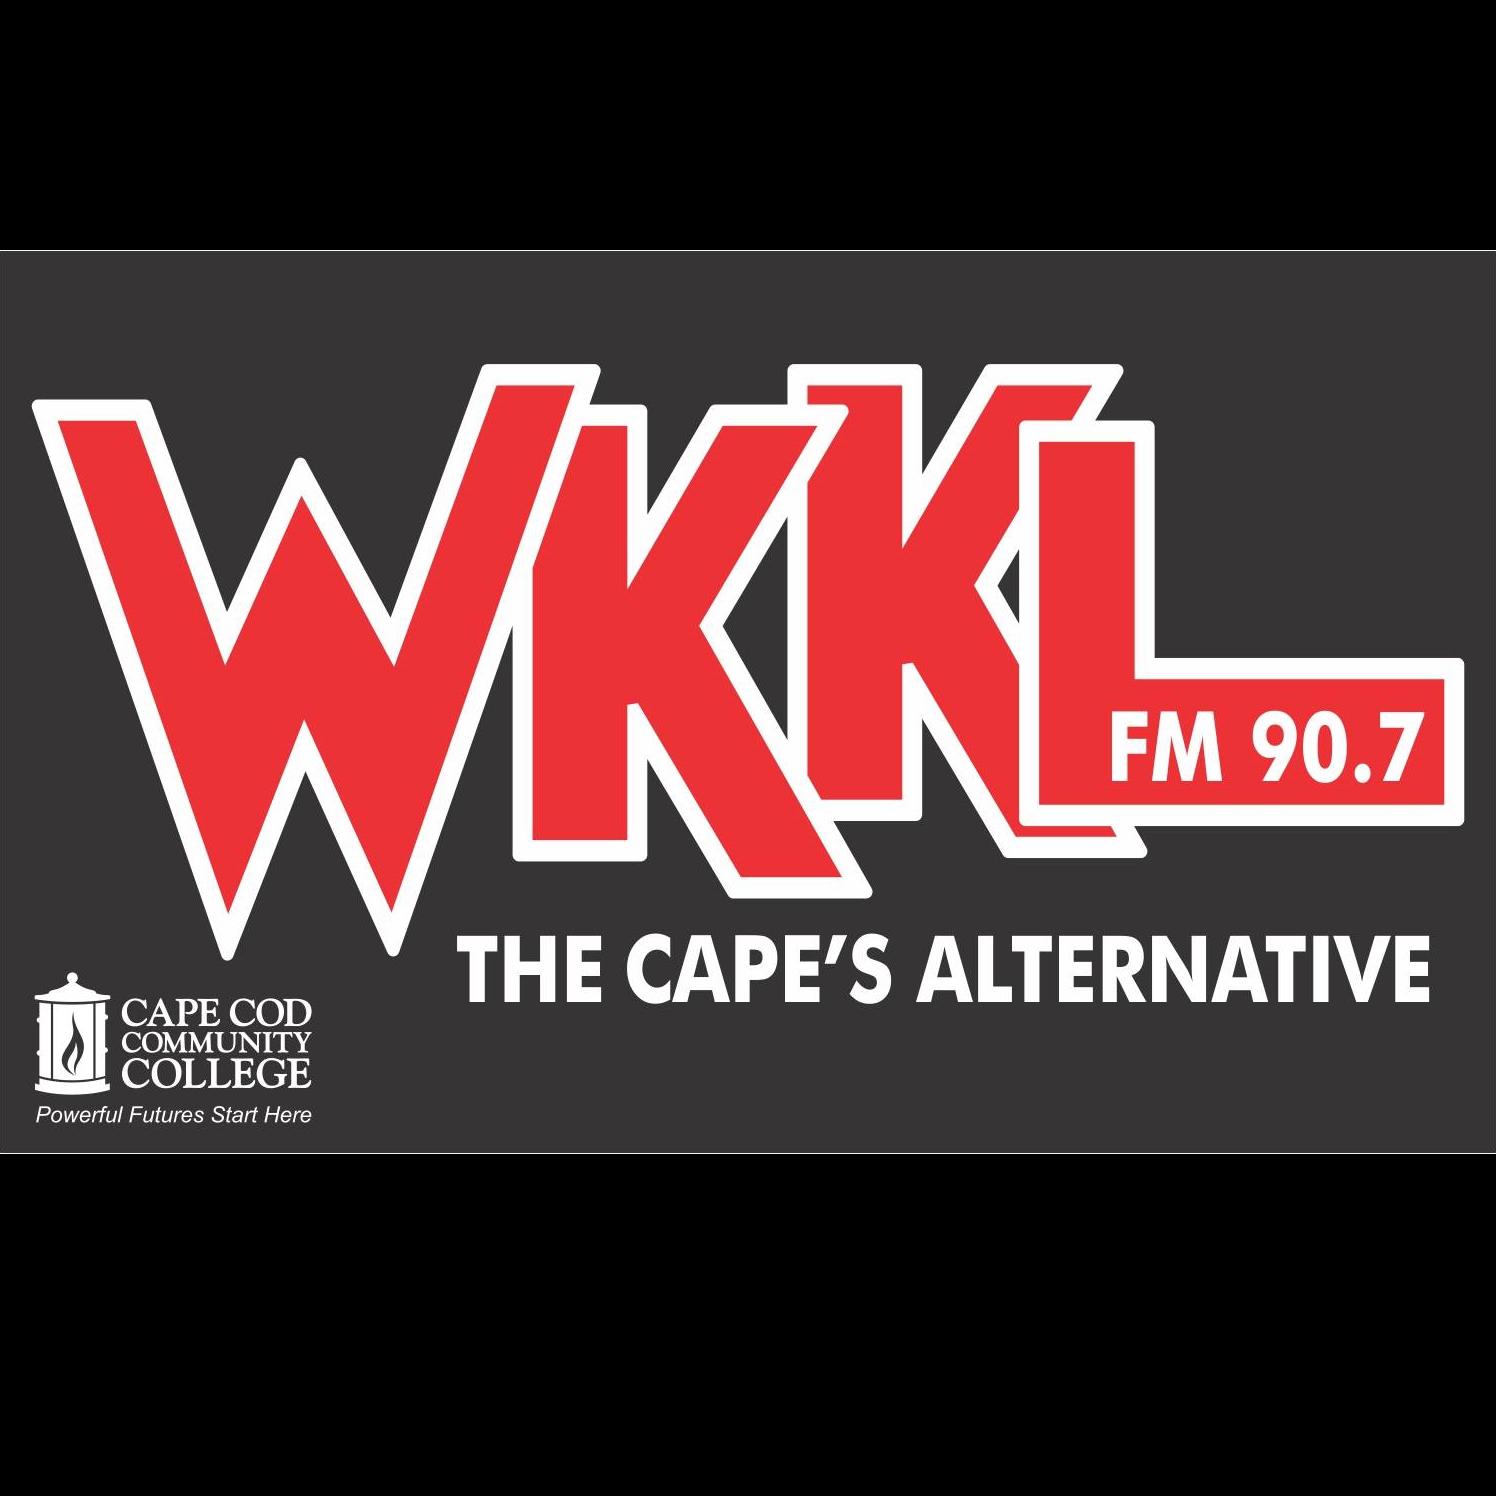 WKKL - Cape Cod Community College